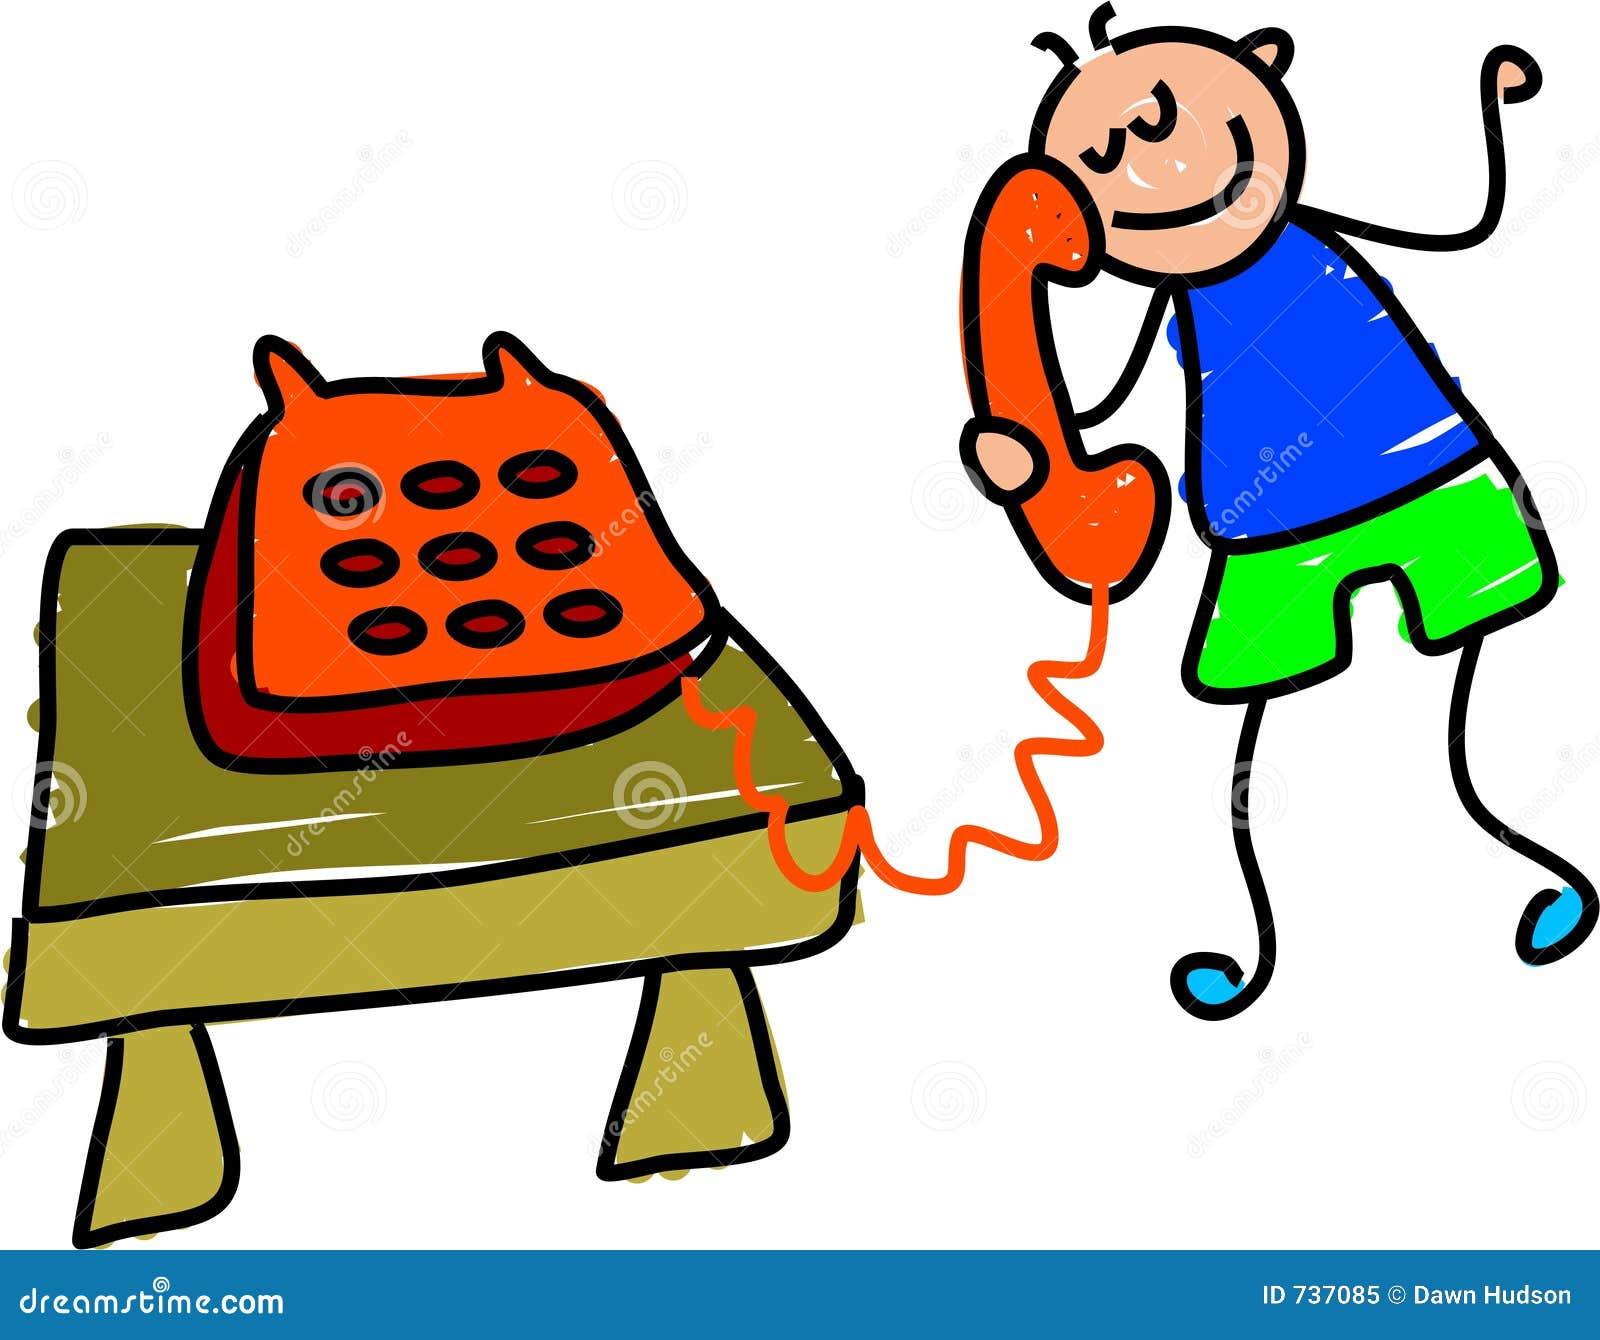 Telephone kid stock illustration. Illustration of objects ...